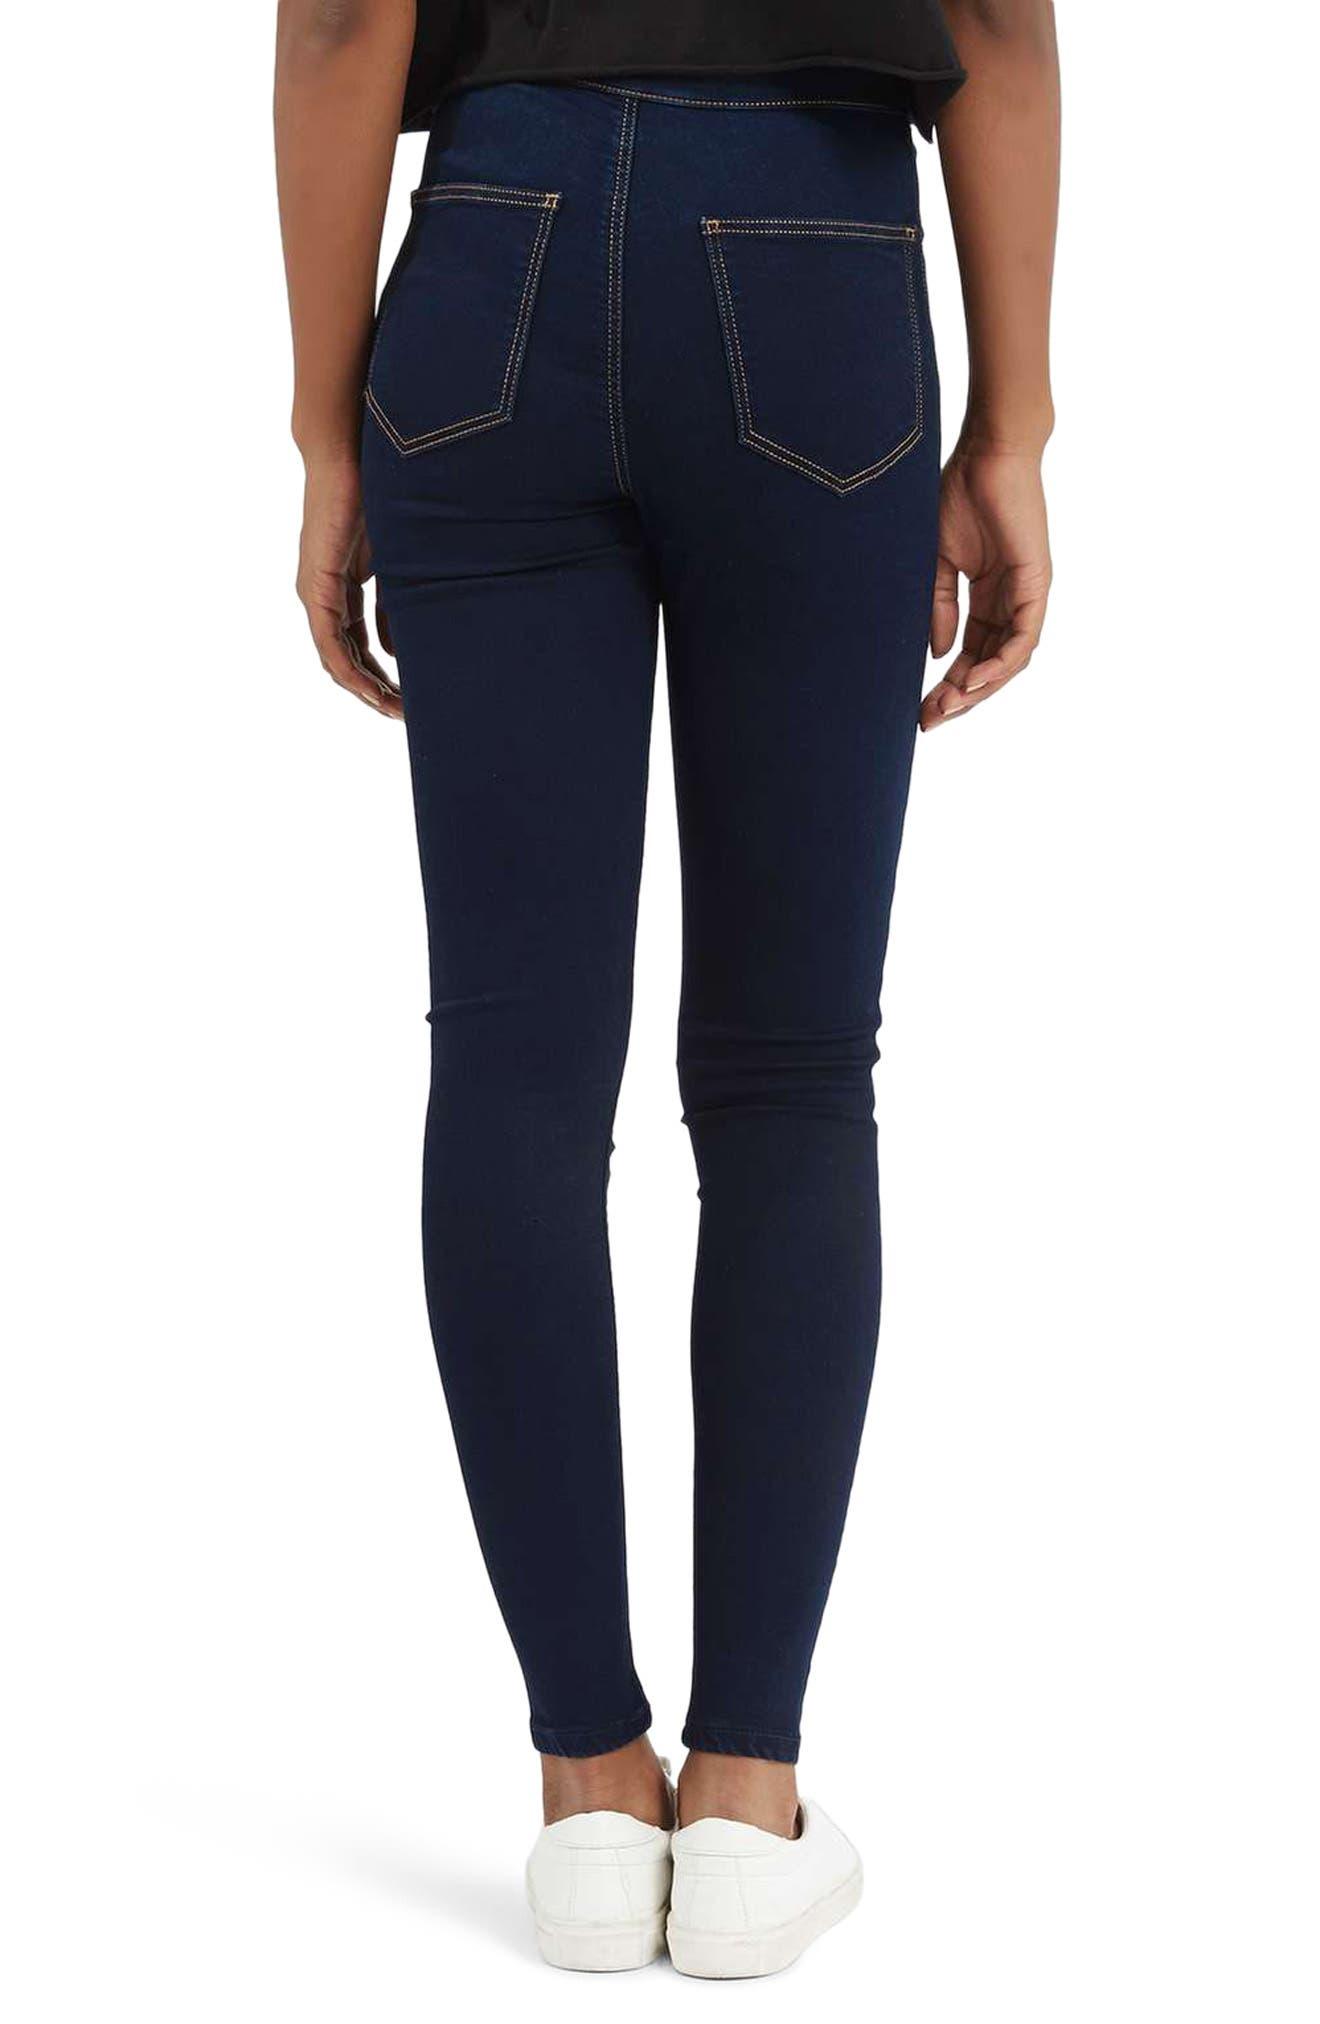 TOPSHOP,                             Joni High Waist Skinny Jeans,                             Alternate thumbnail 2, color,                             400